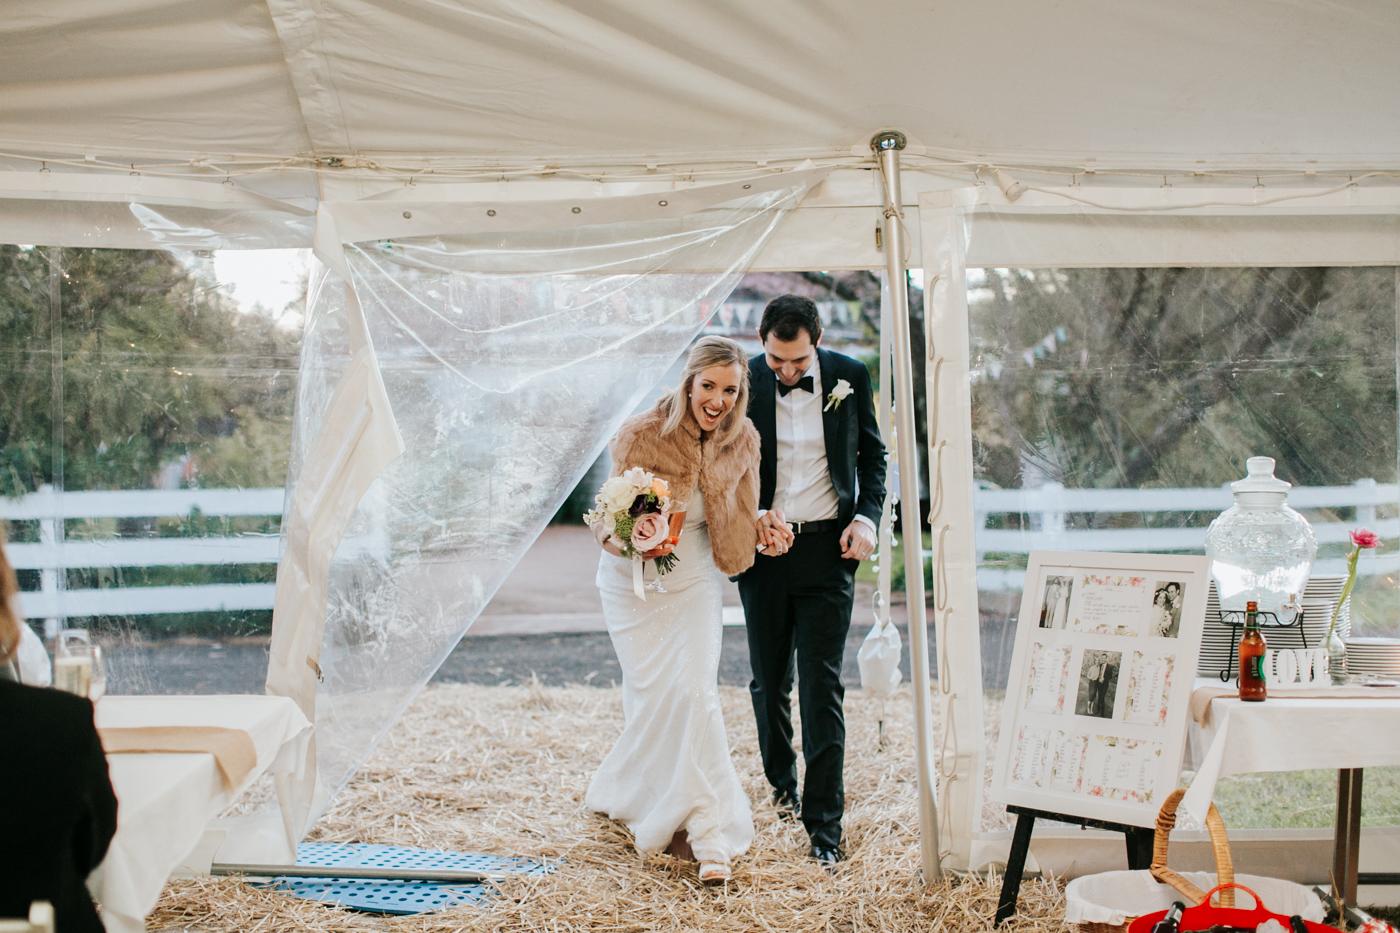 Bridget & James - Orange Country Wedding - Samantha Heather Photography-200.jpg